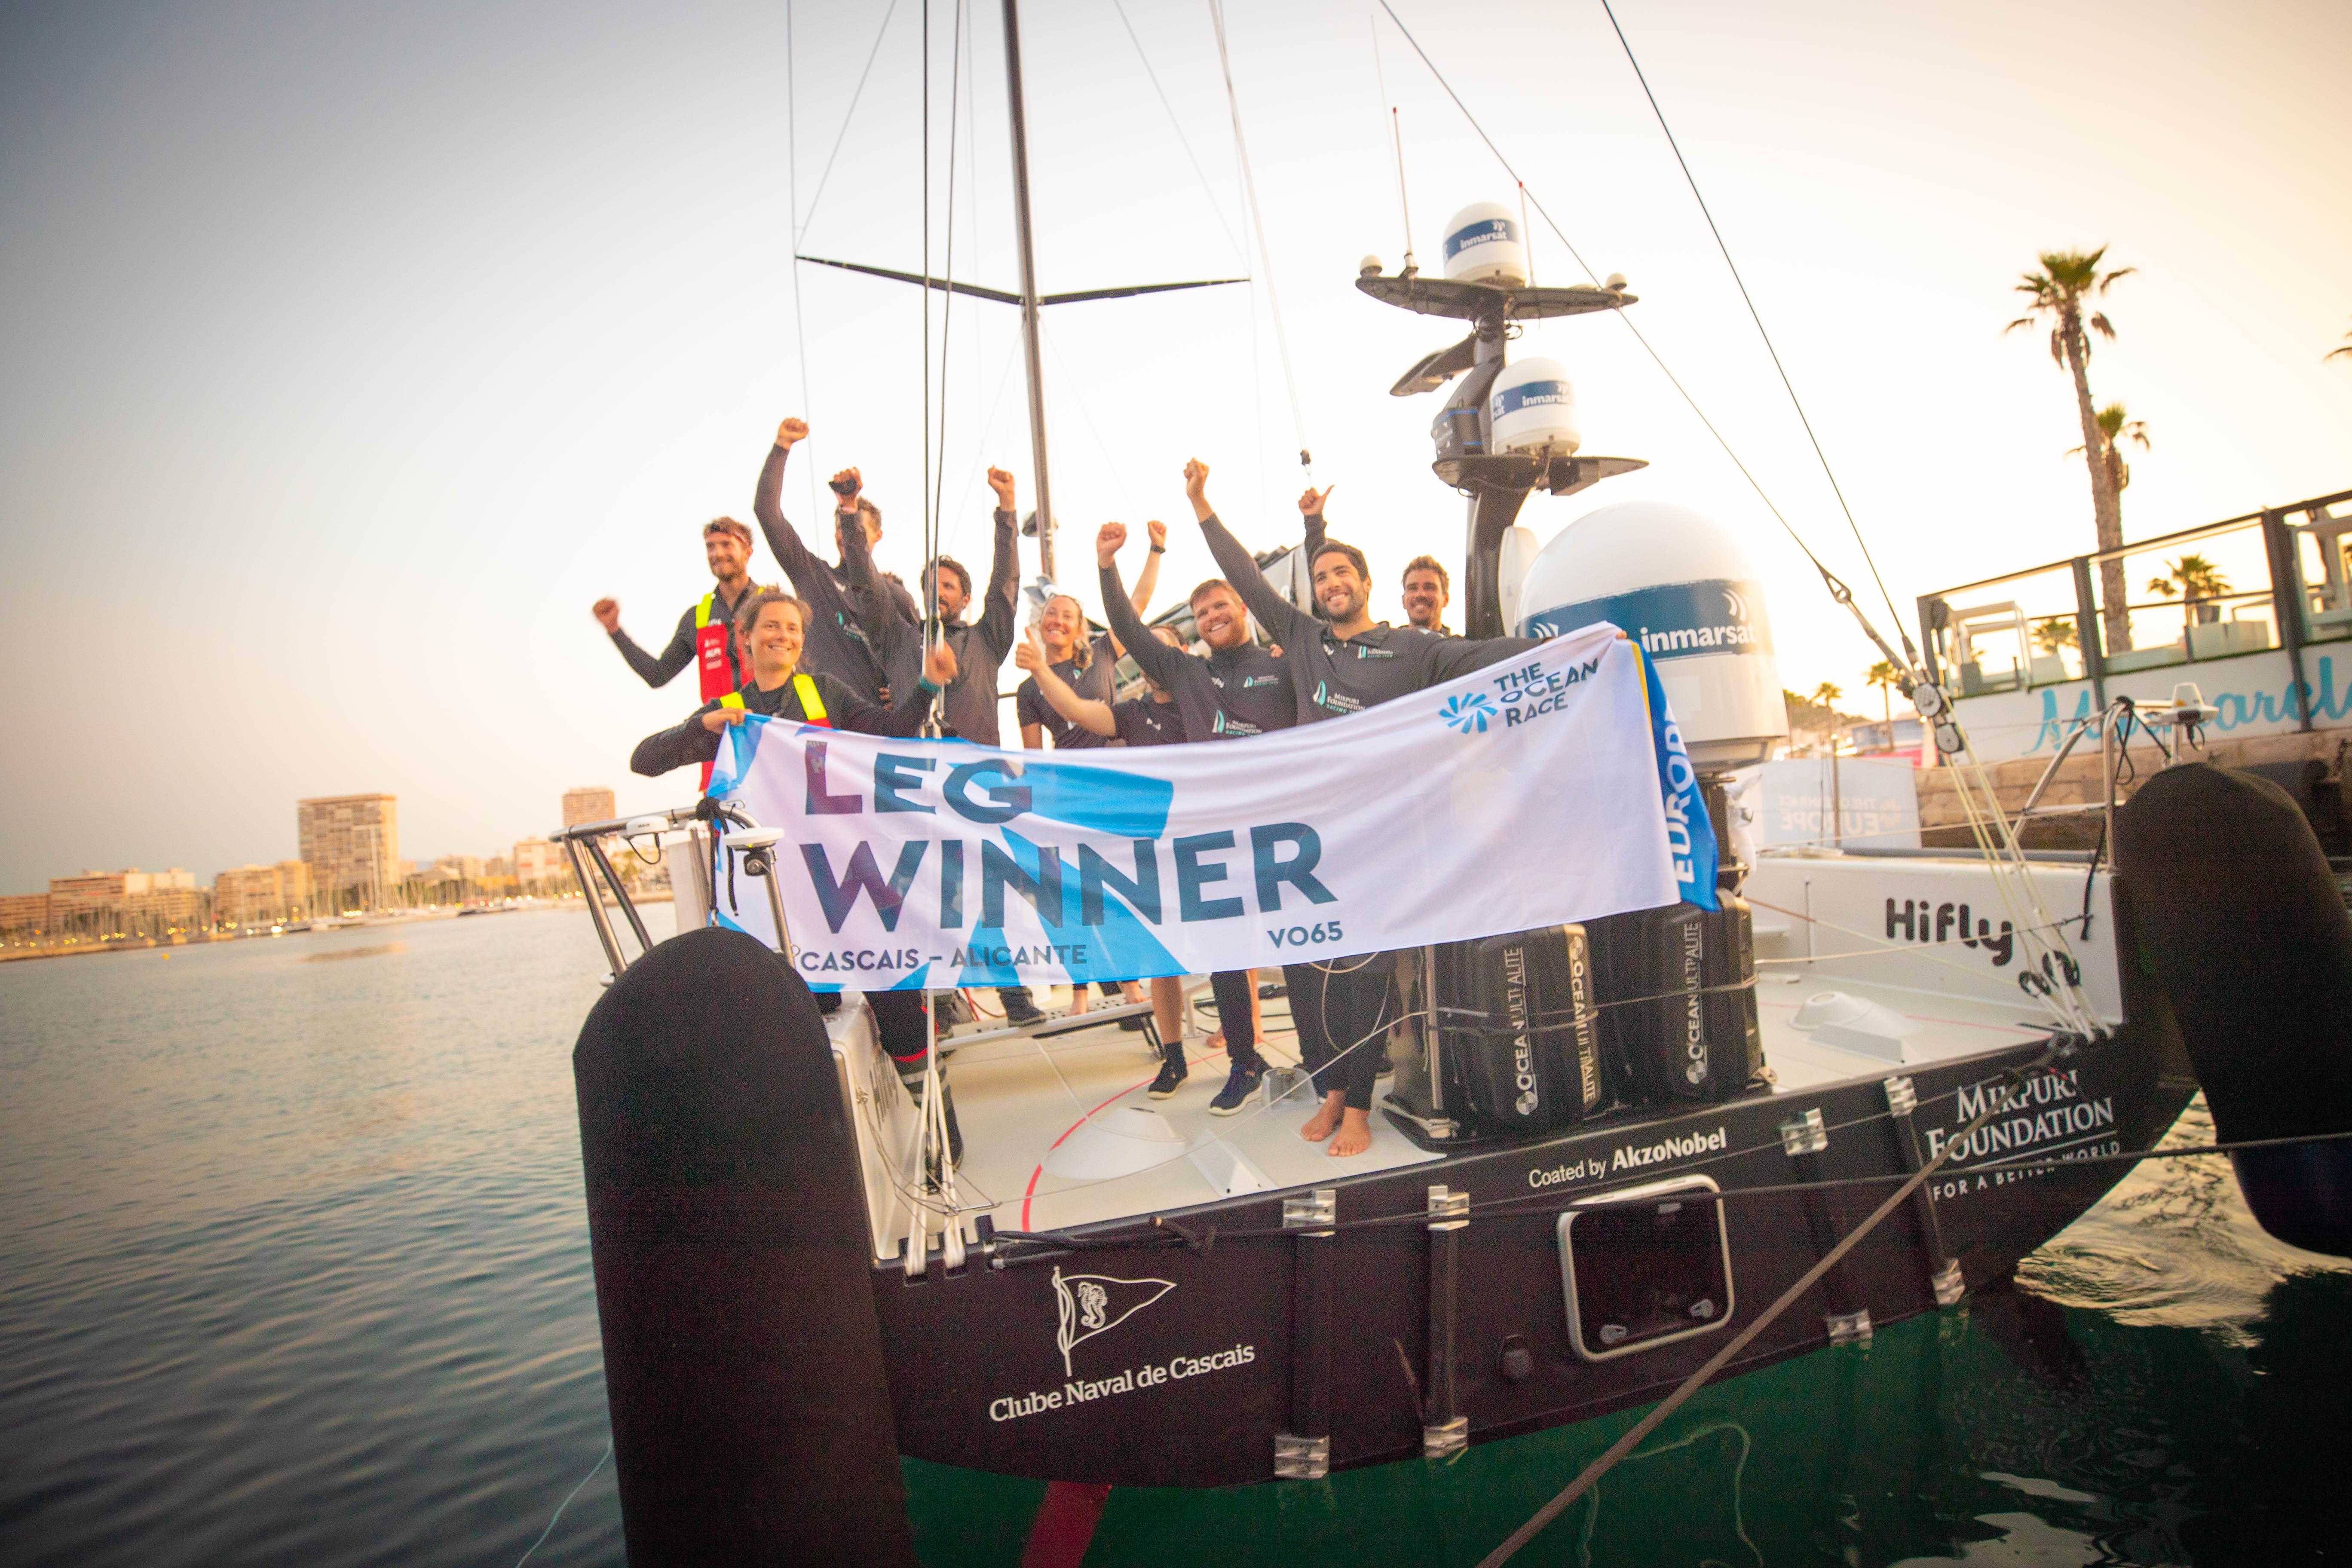 Mirpuri Foundation Racing Team wins Leg 2 in Alicante